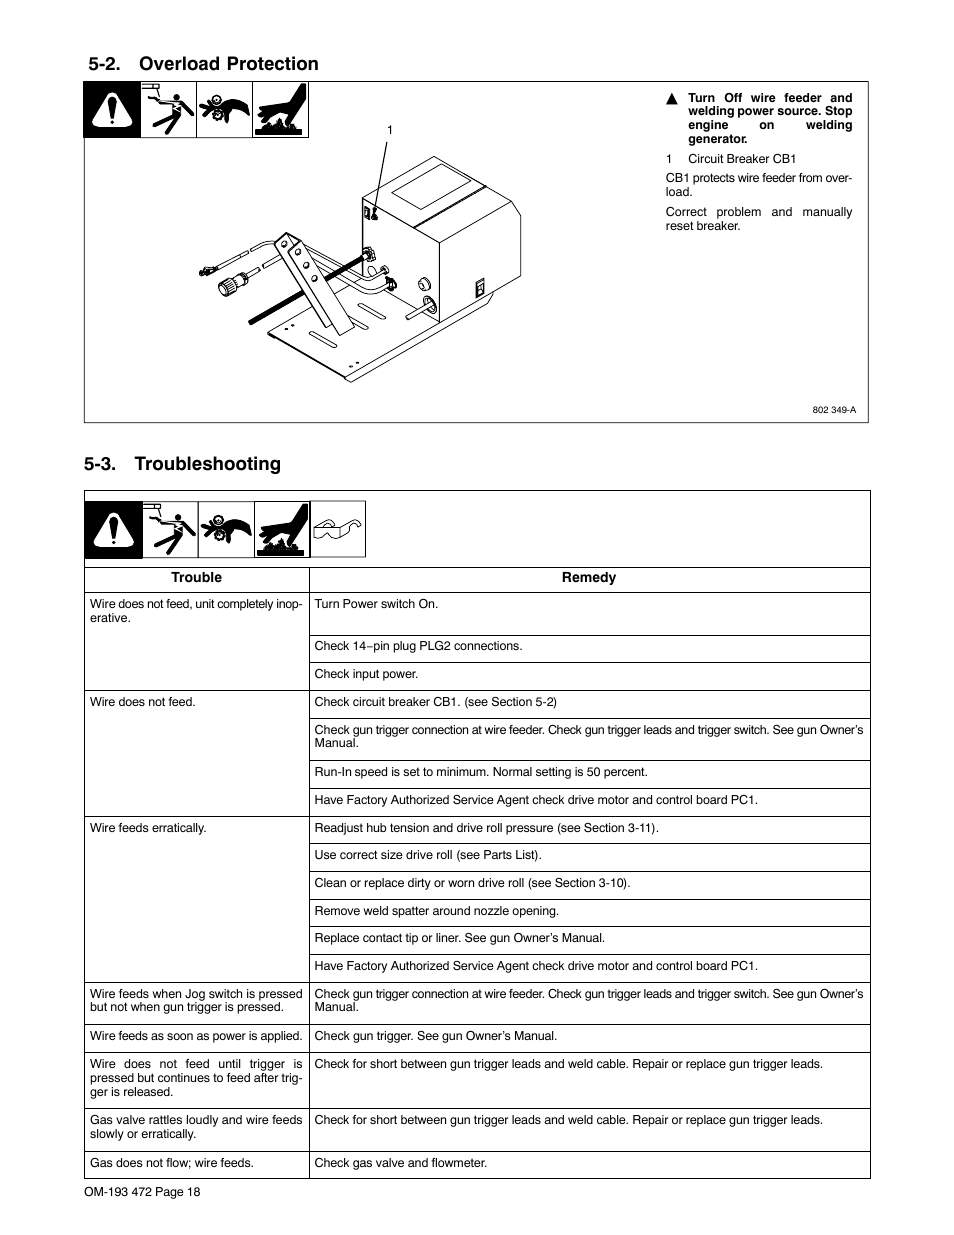 medium resolution of miller 350p wiring diagram 4k wiki wallpapers 2018 millermatic 350p review millermatic 350p wiring diagram